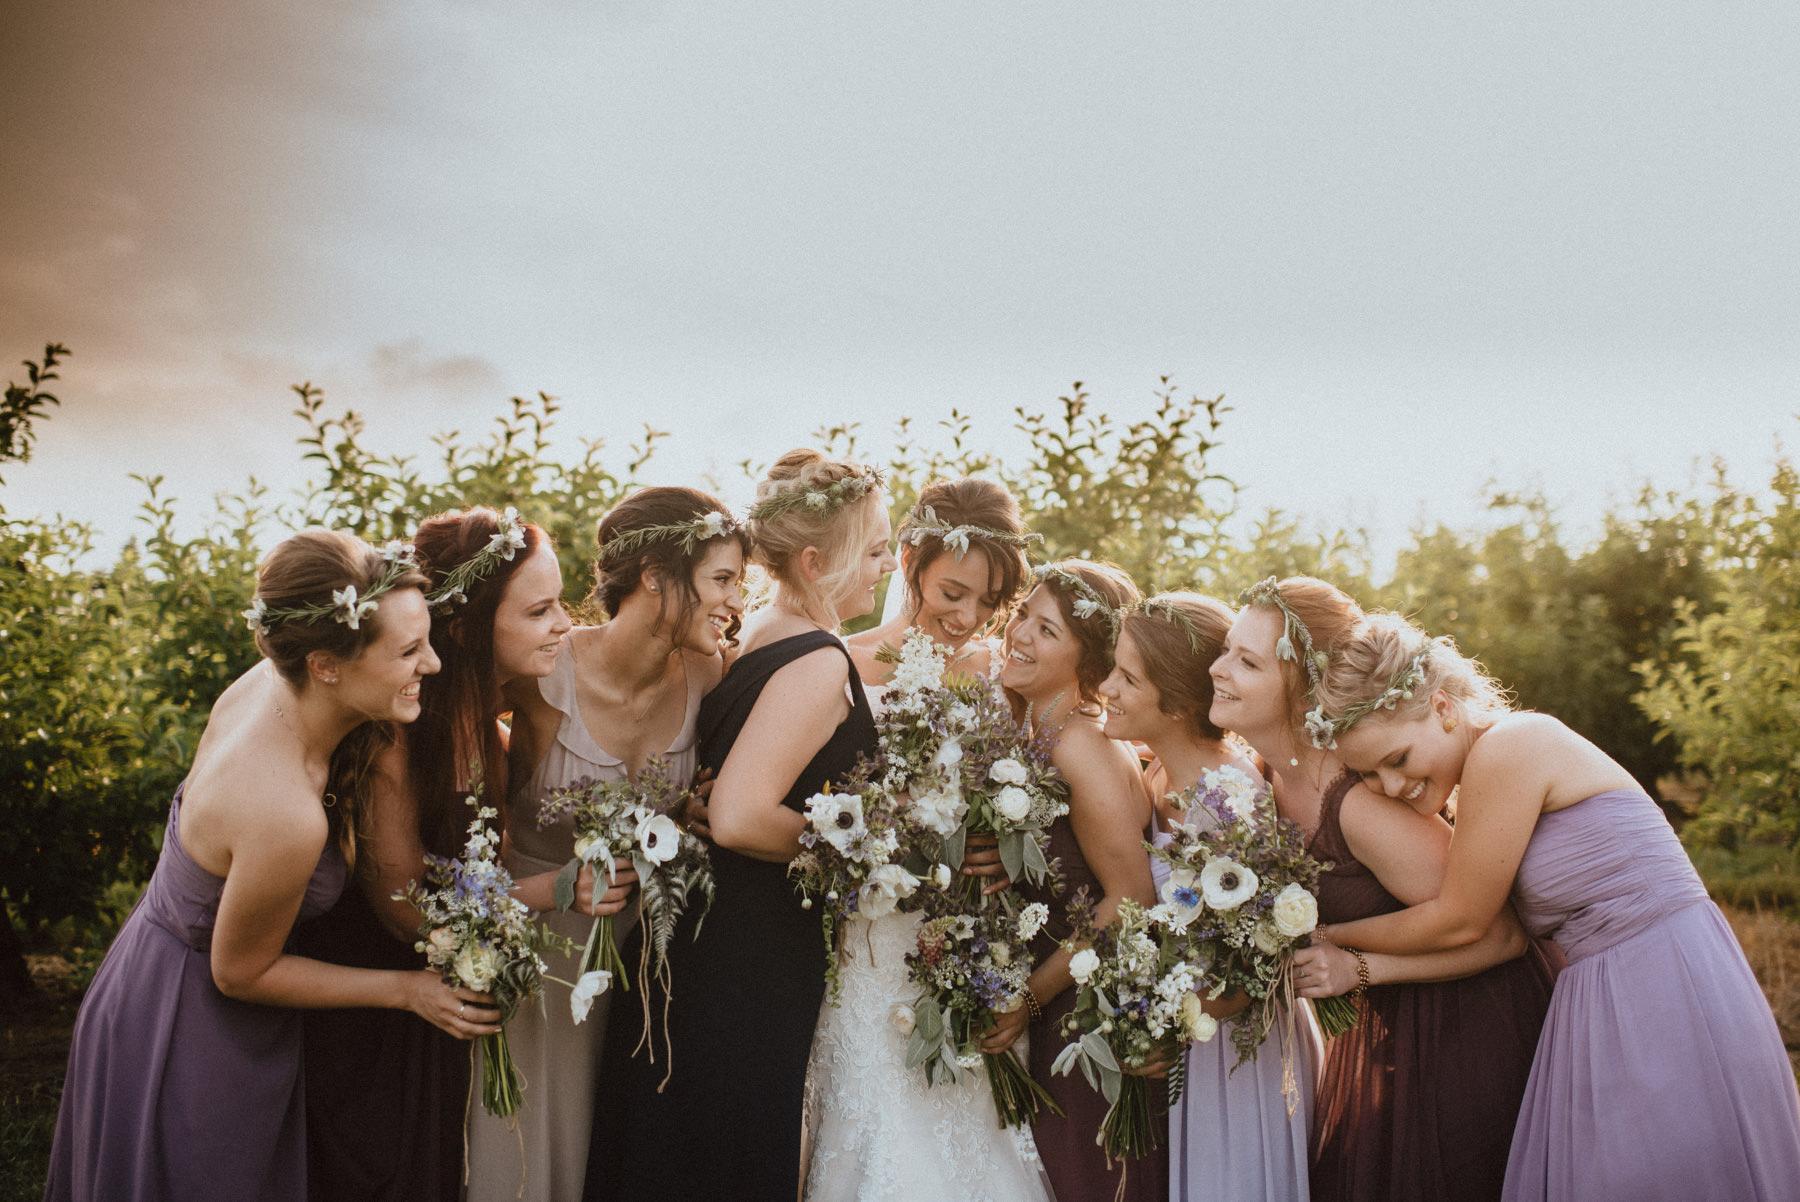 183-milburn-orchards-wedding-3.jpg